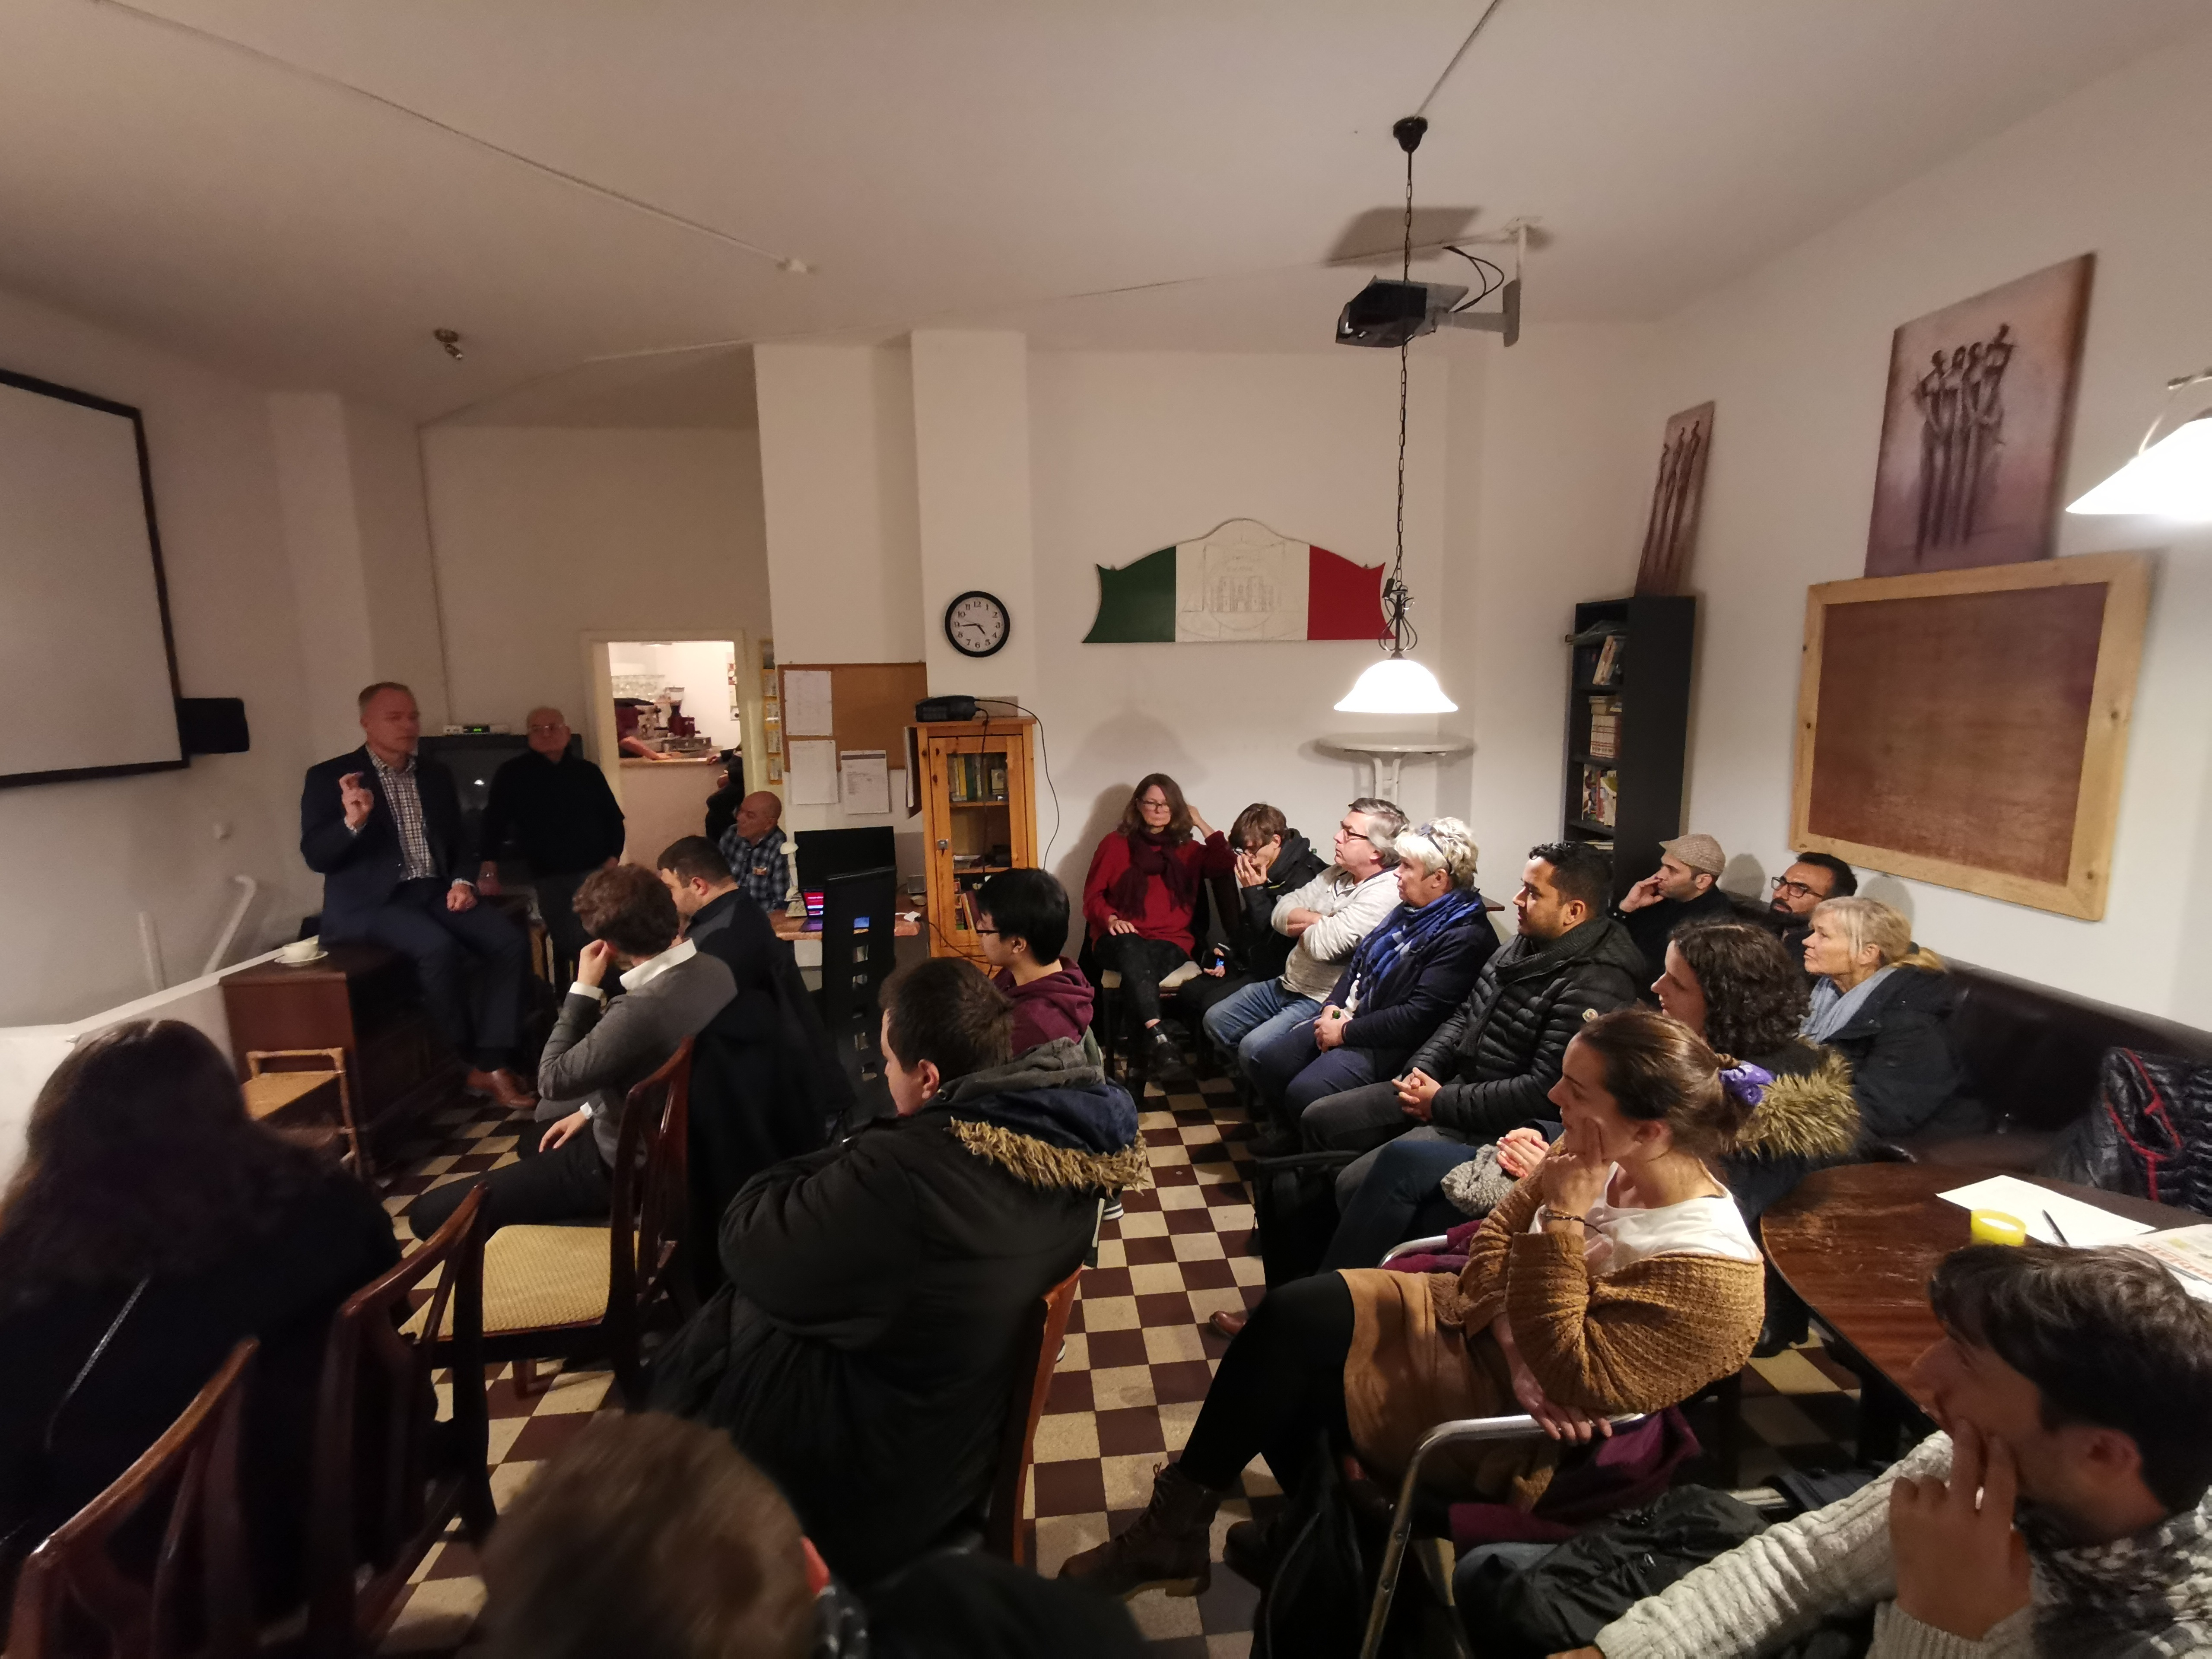 SPD -Aufmerksame Zuhörer bei der SPD-Veranstaltung